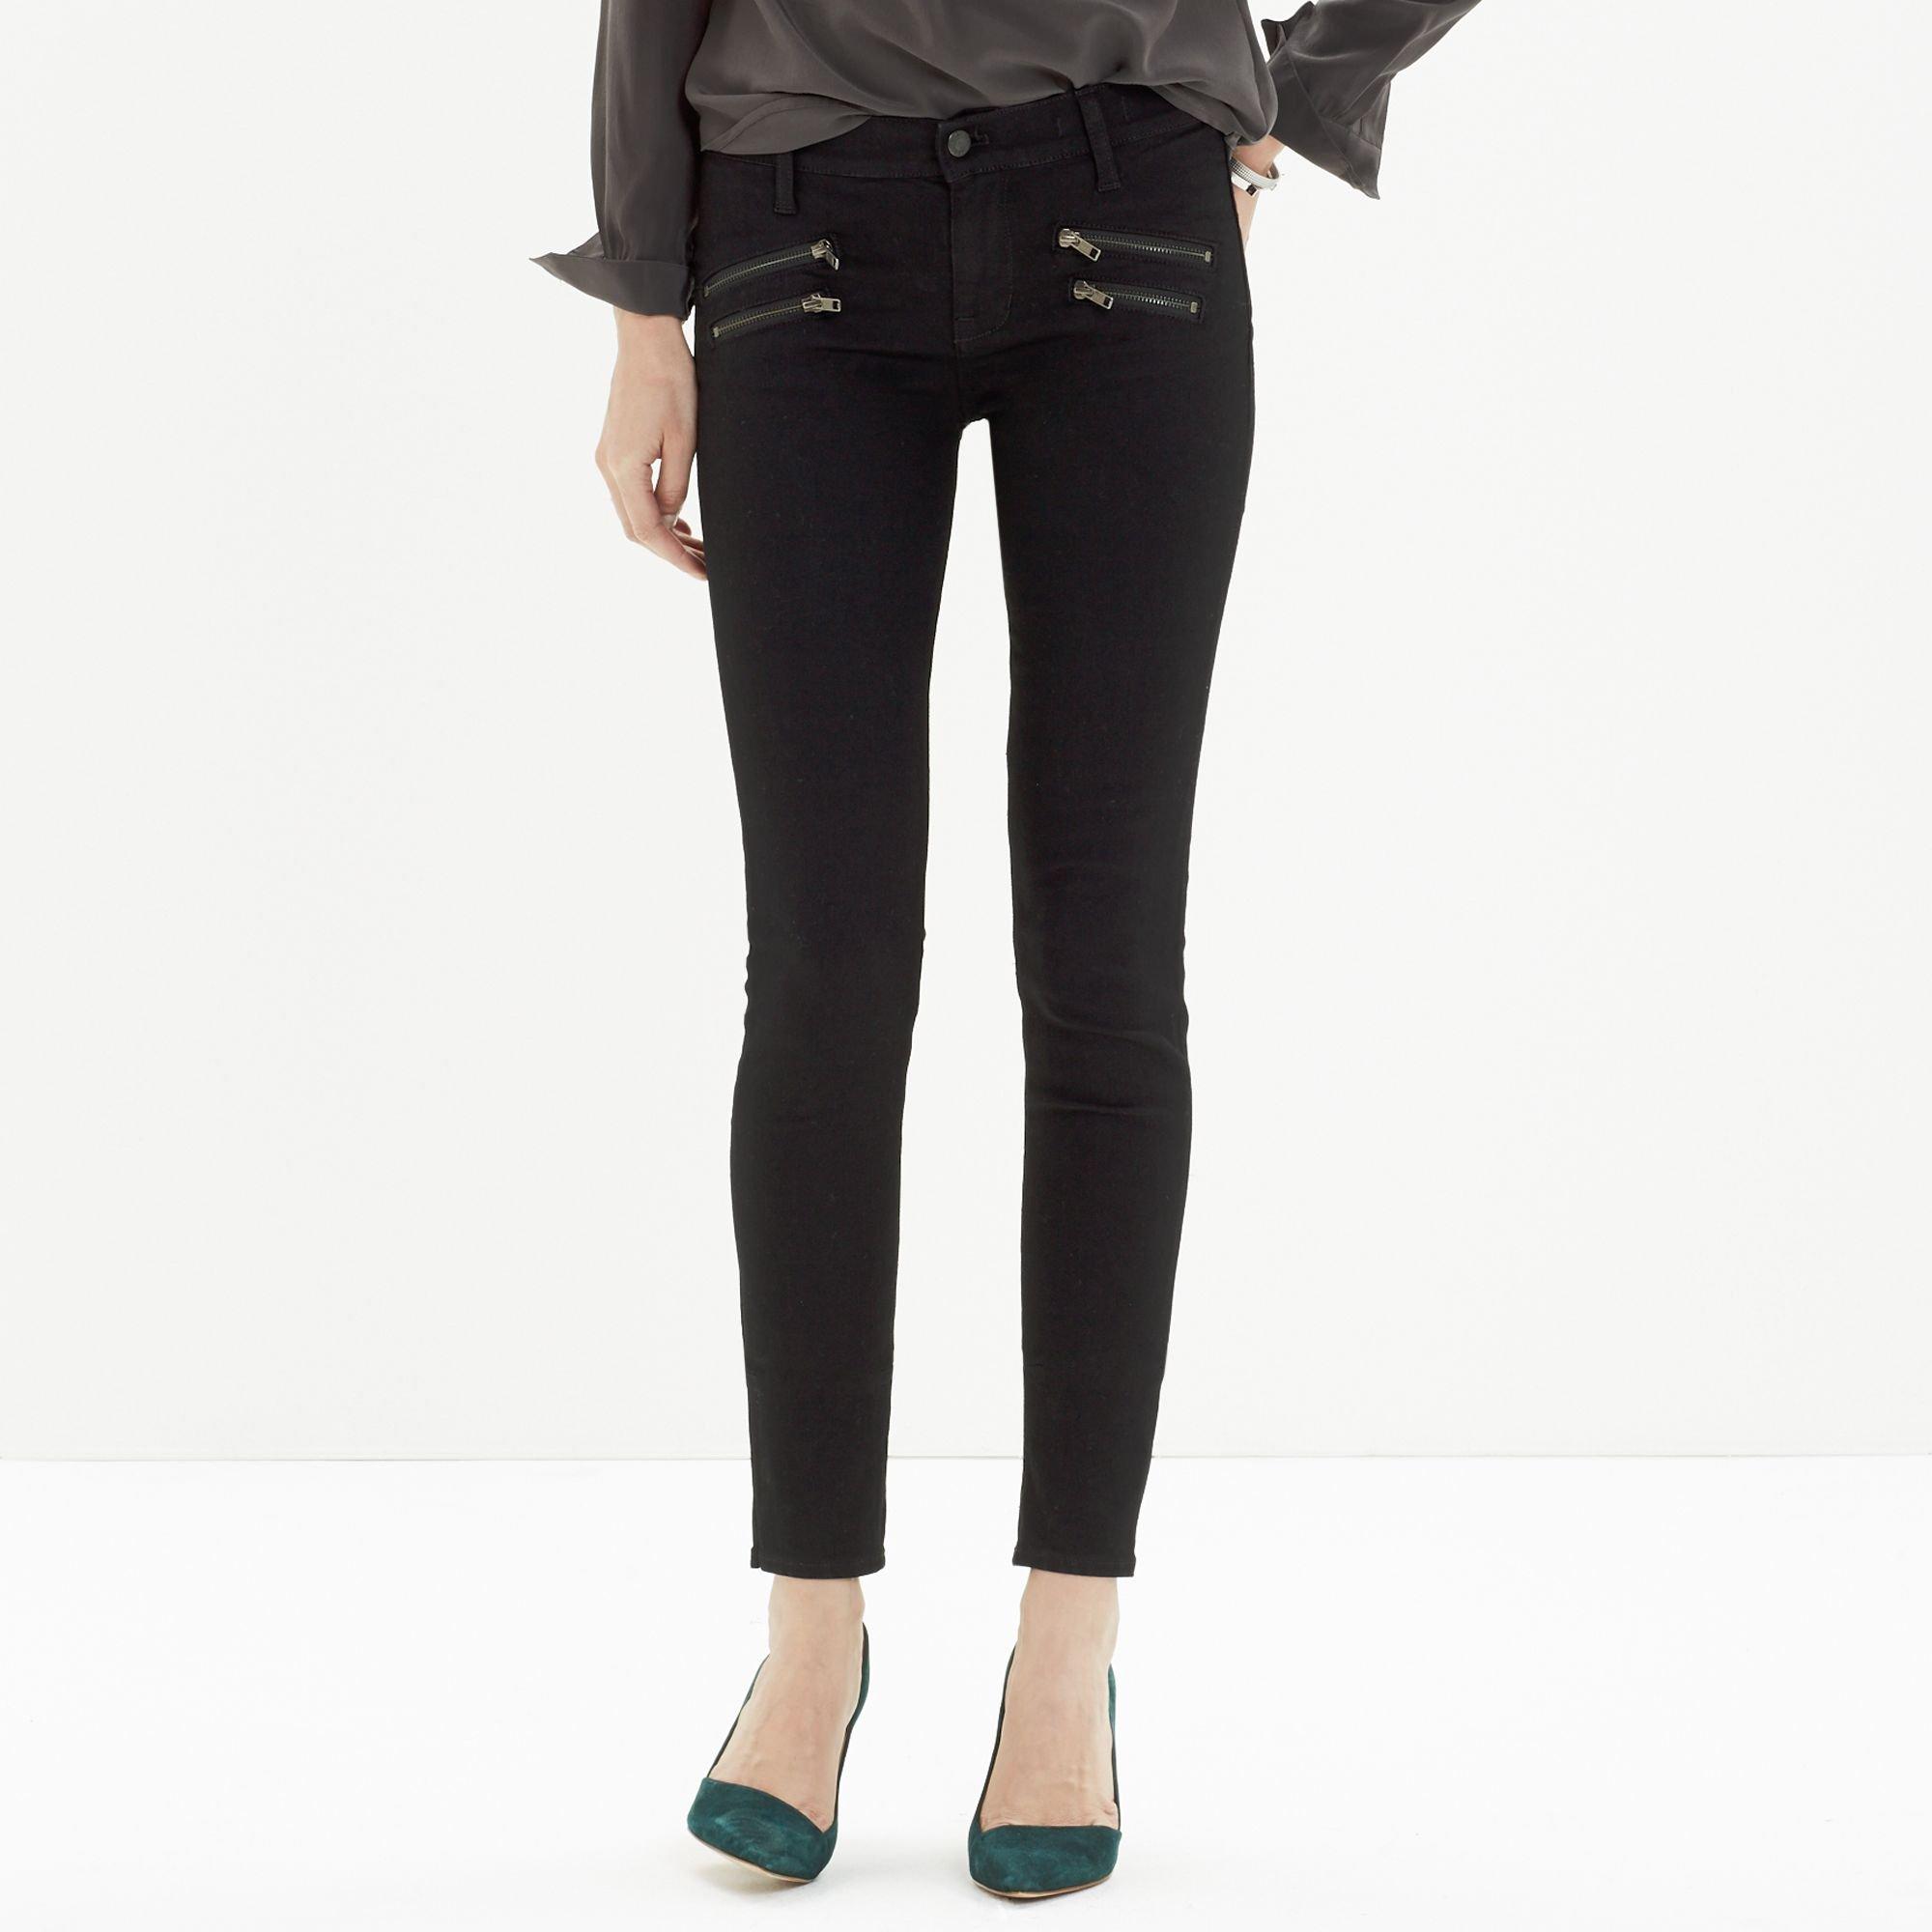 Madewell Skinny Skinny Jeans: Biker-zip Edition in Black | Lyst